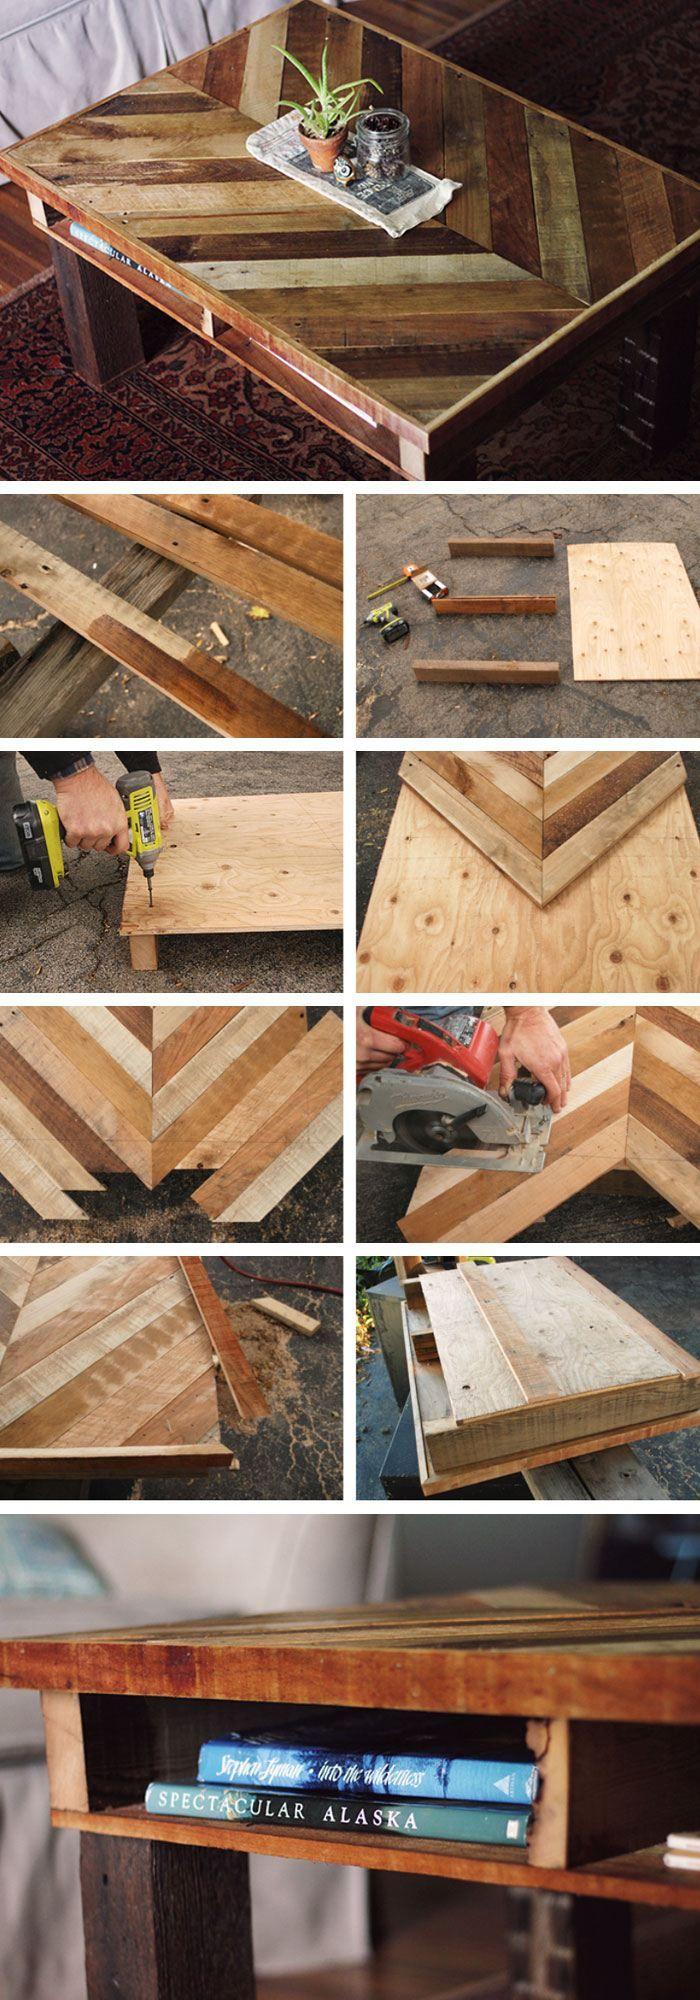 DIY Pallet Coffee Table   DIY Home Decor Ideas on a Budget   DIY Home Decorating on a Budget